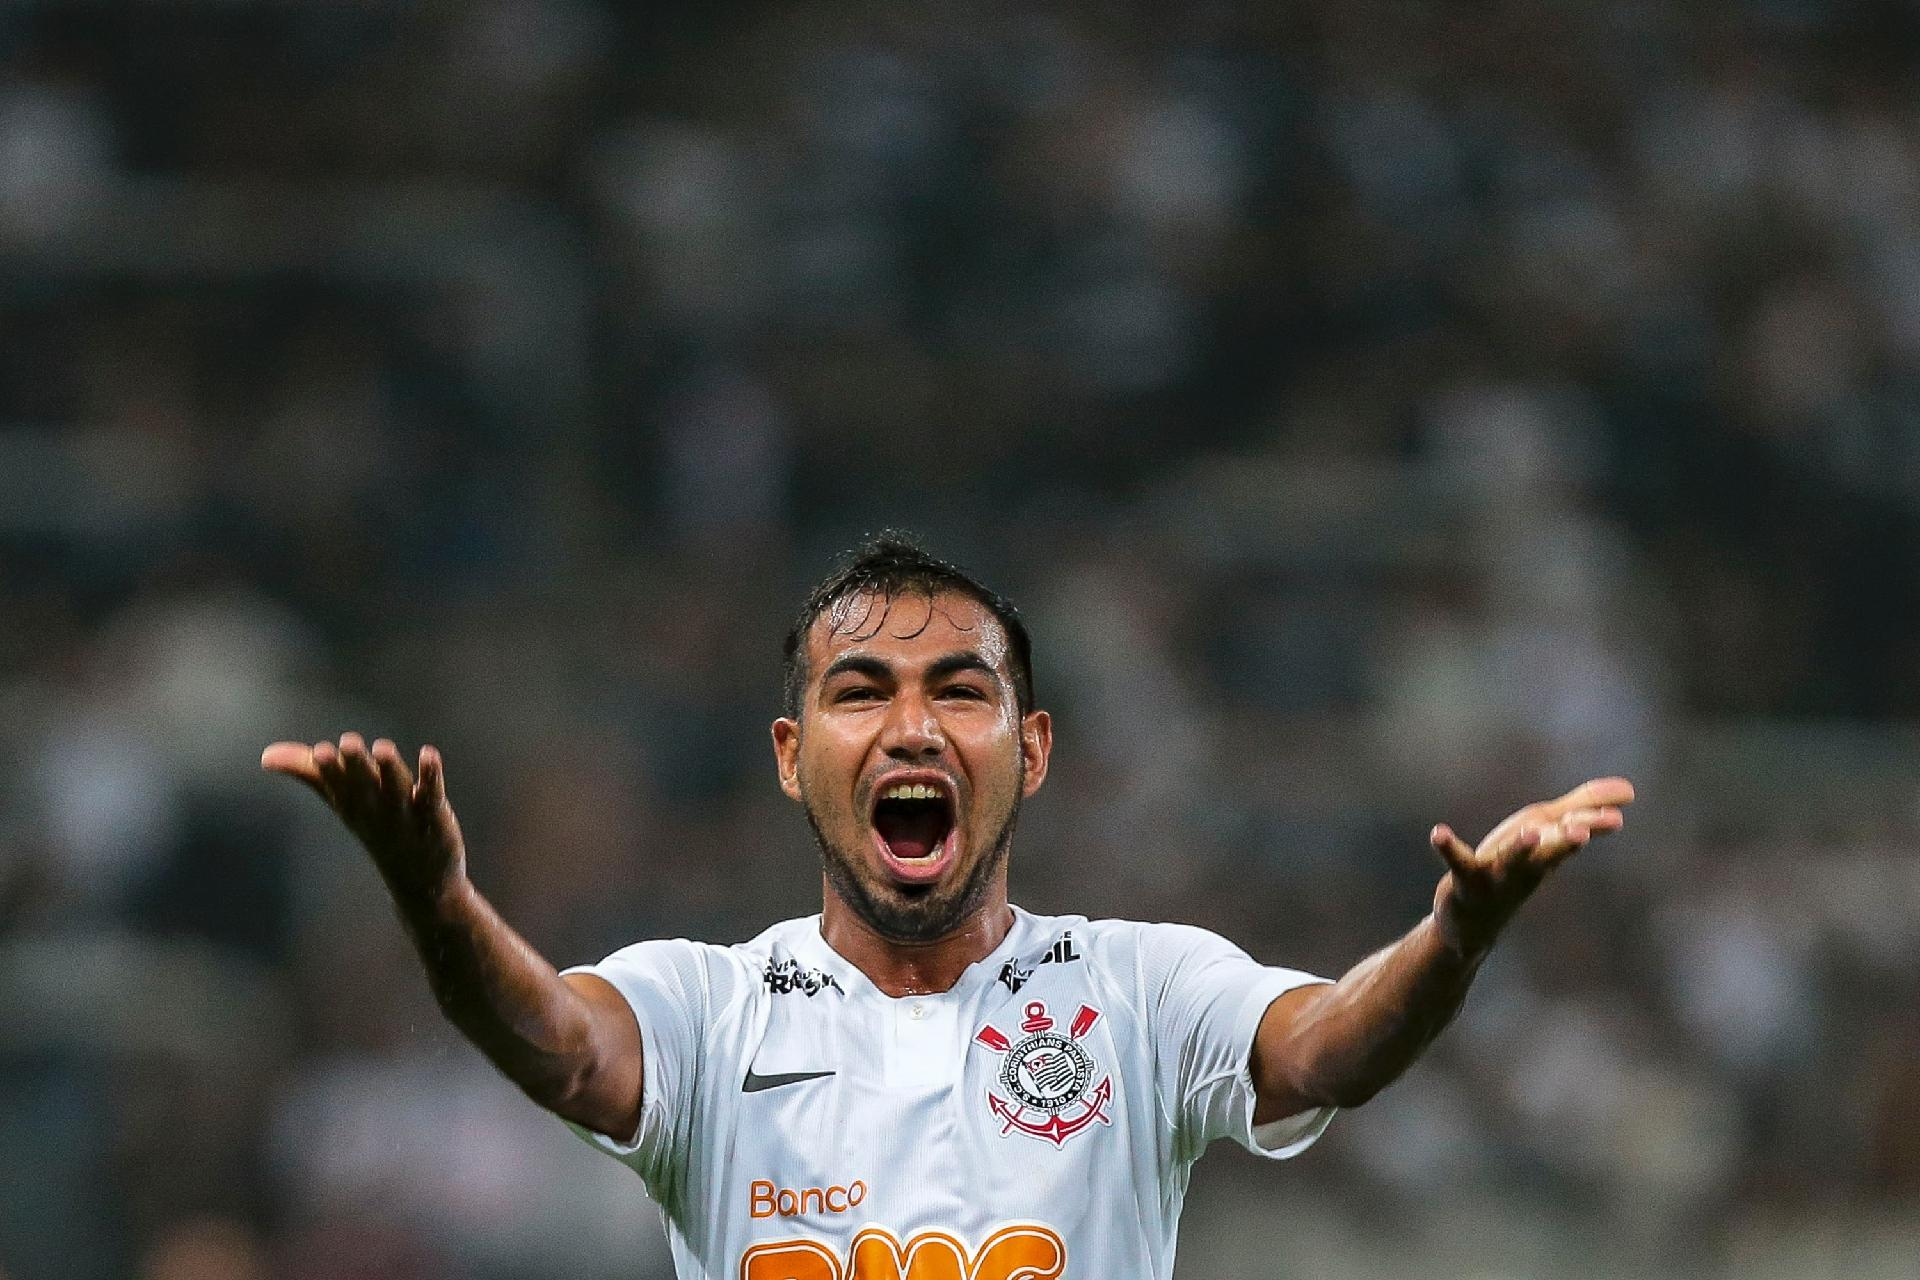 Luxemburgo comenta desempenho do Vasco após derrota